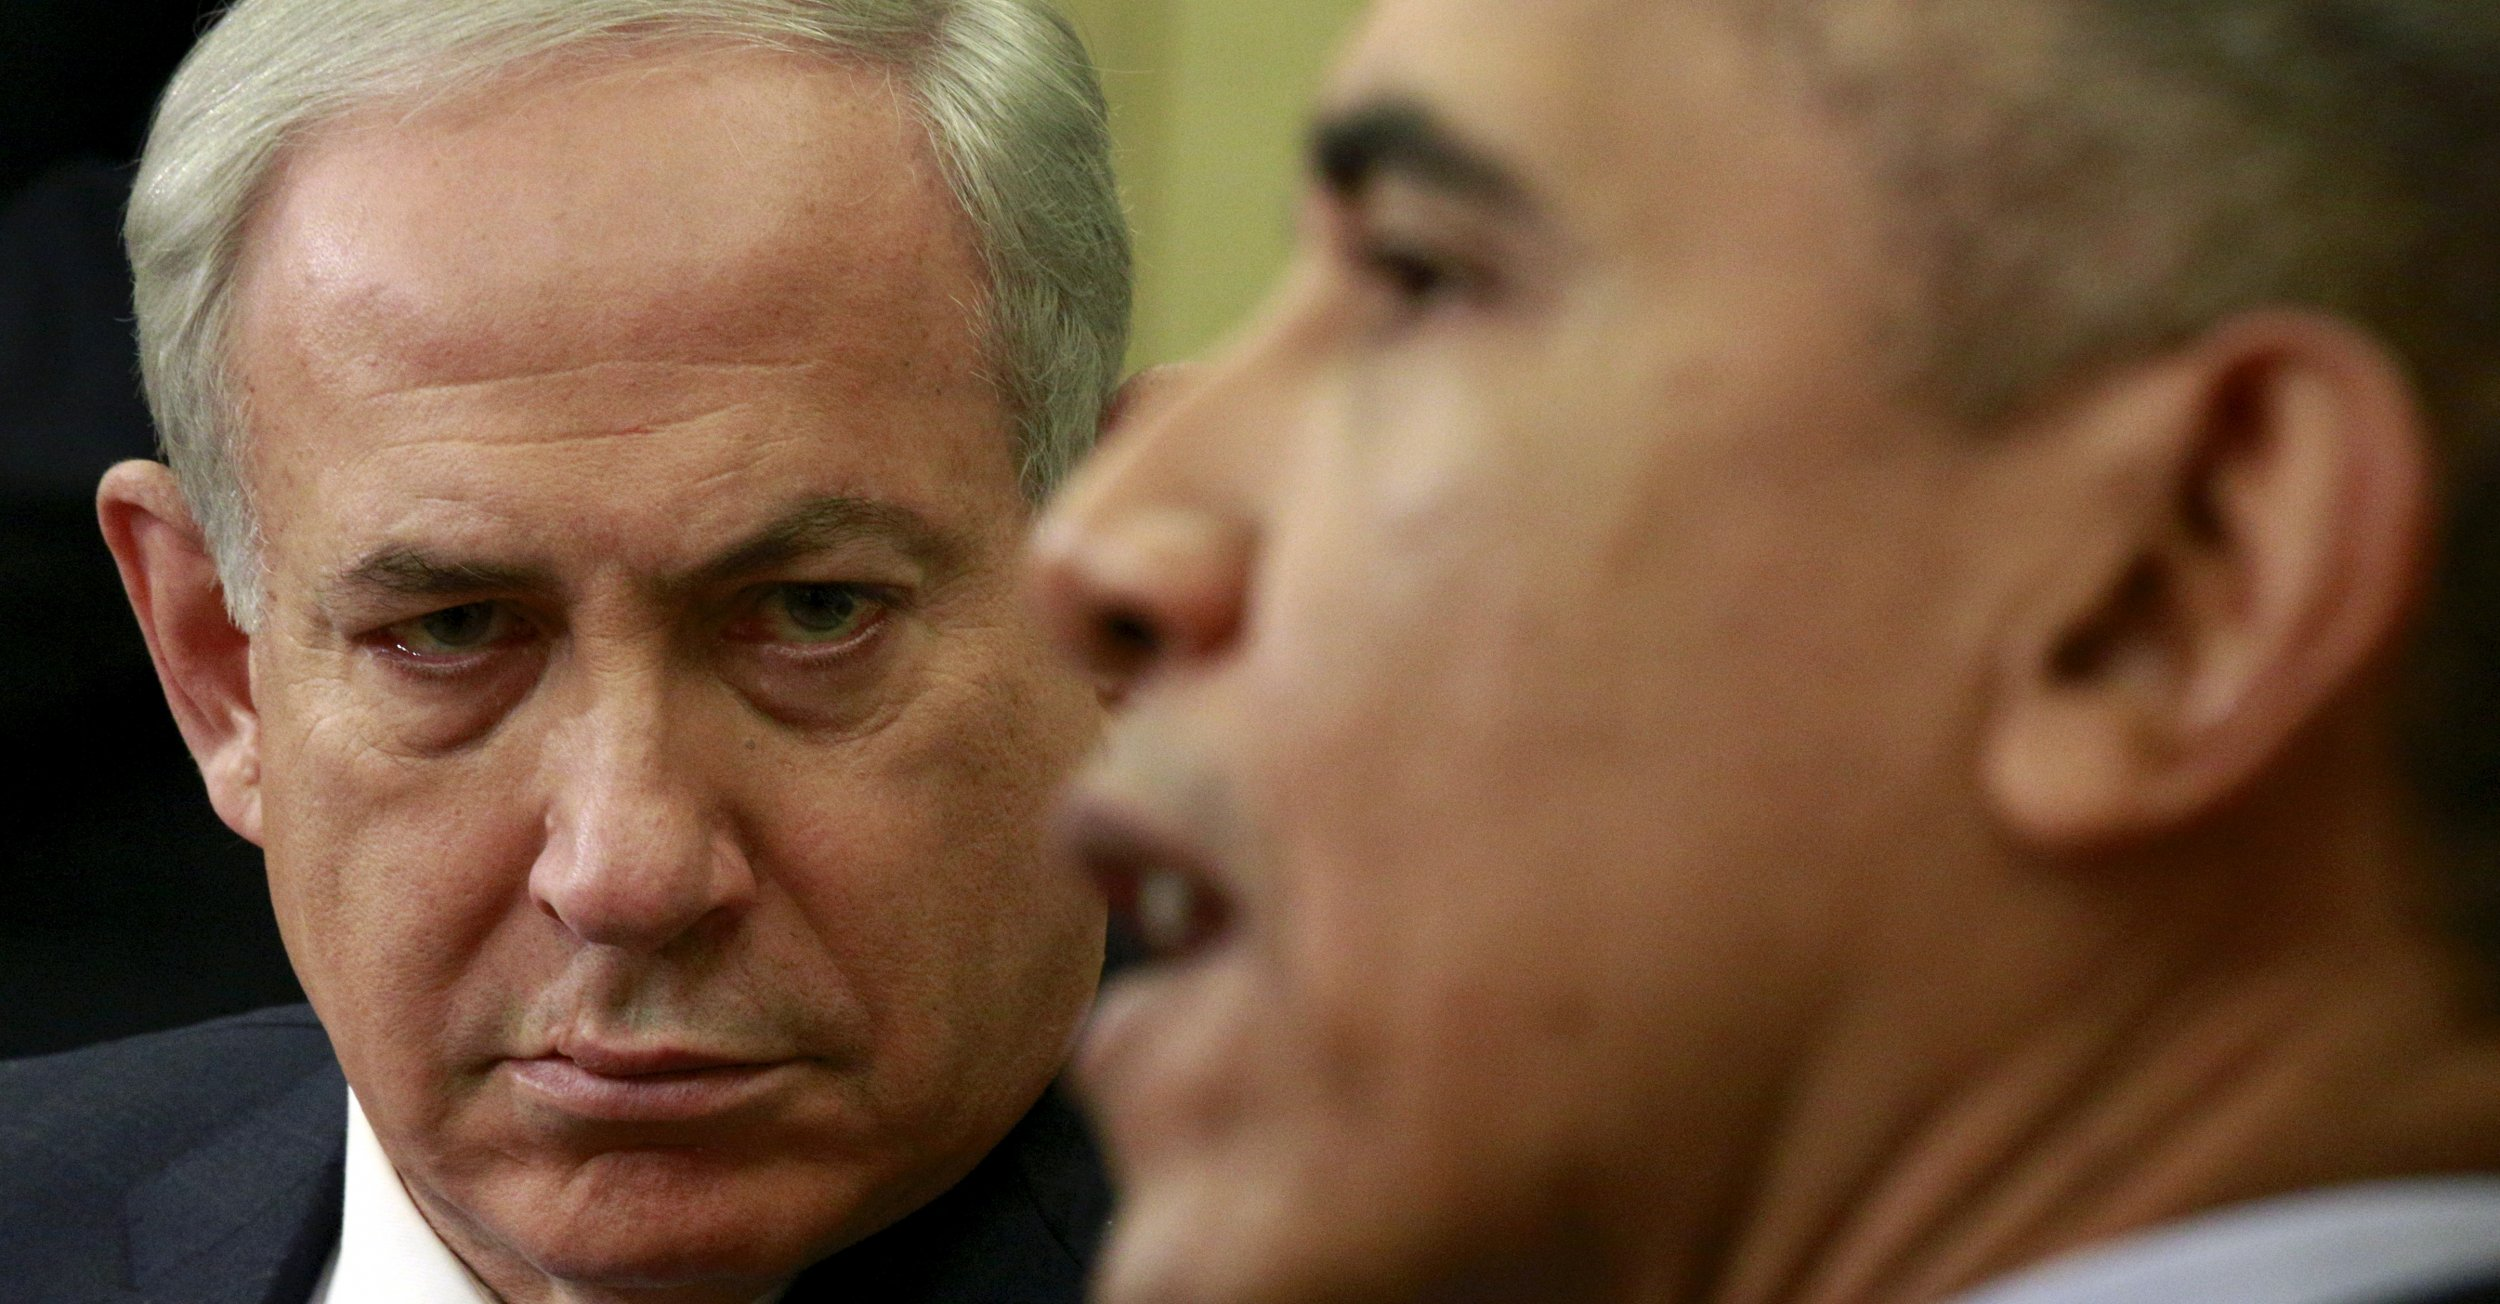 Tel Aviv Diary: Obama Exacts Cold Revenge on Netanyahu